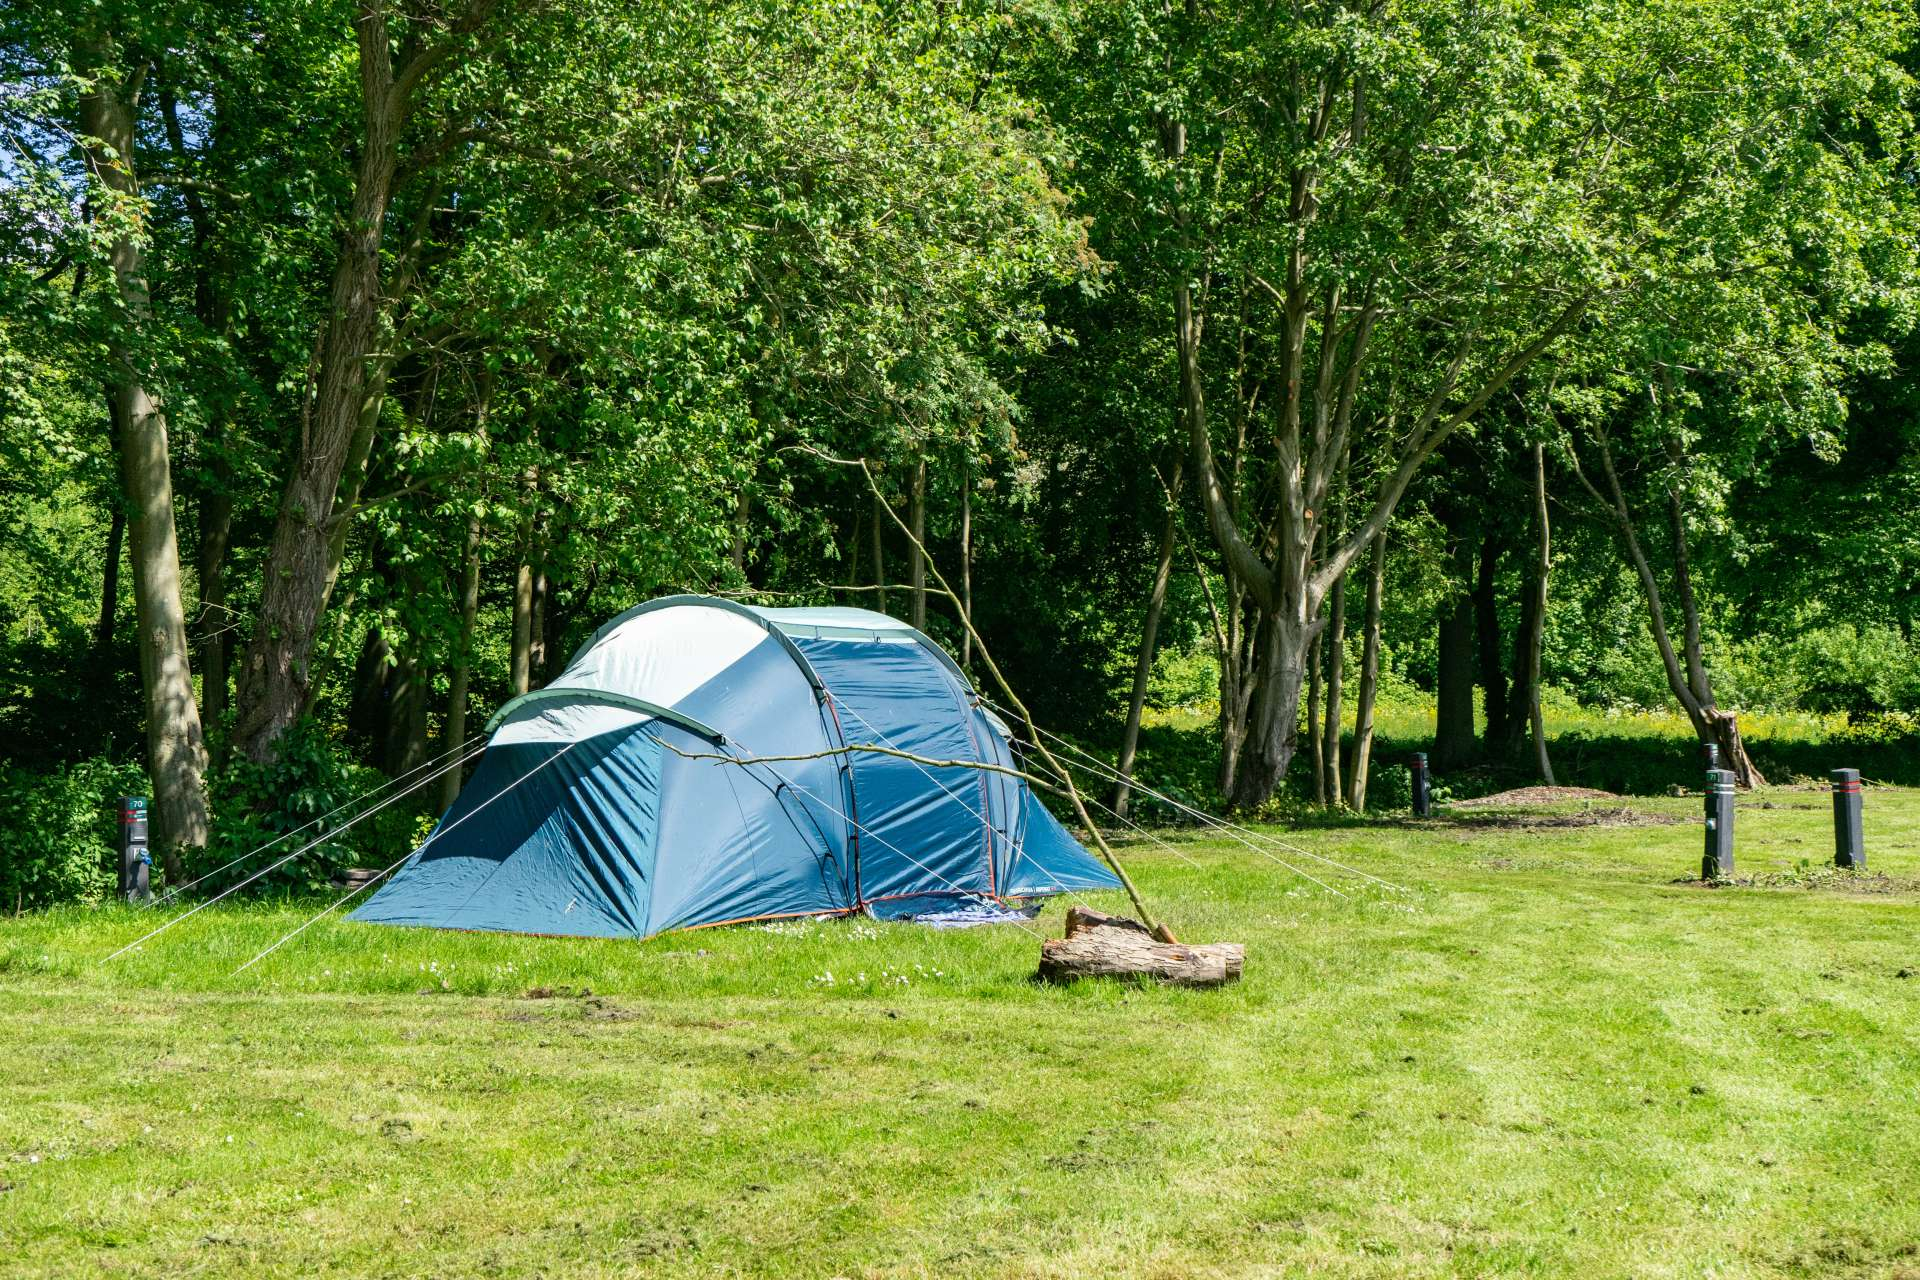 camping-outside-europarcs-het-amsterdamse-bos